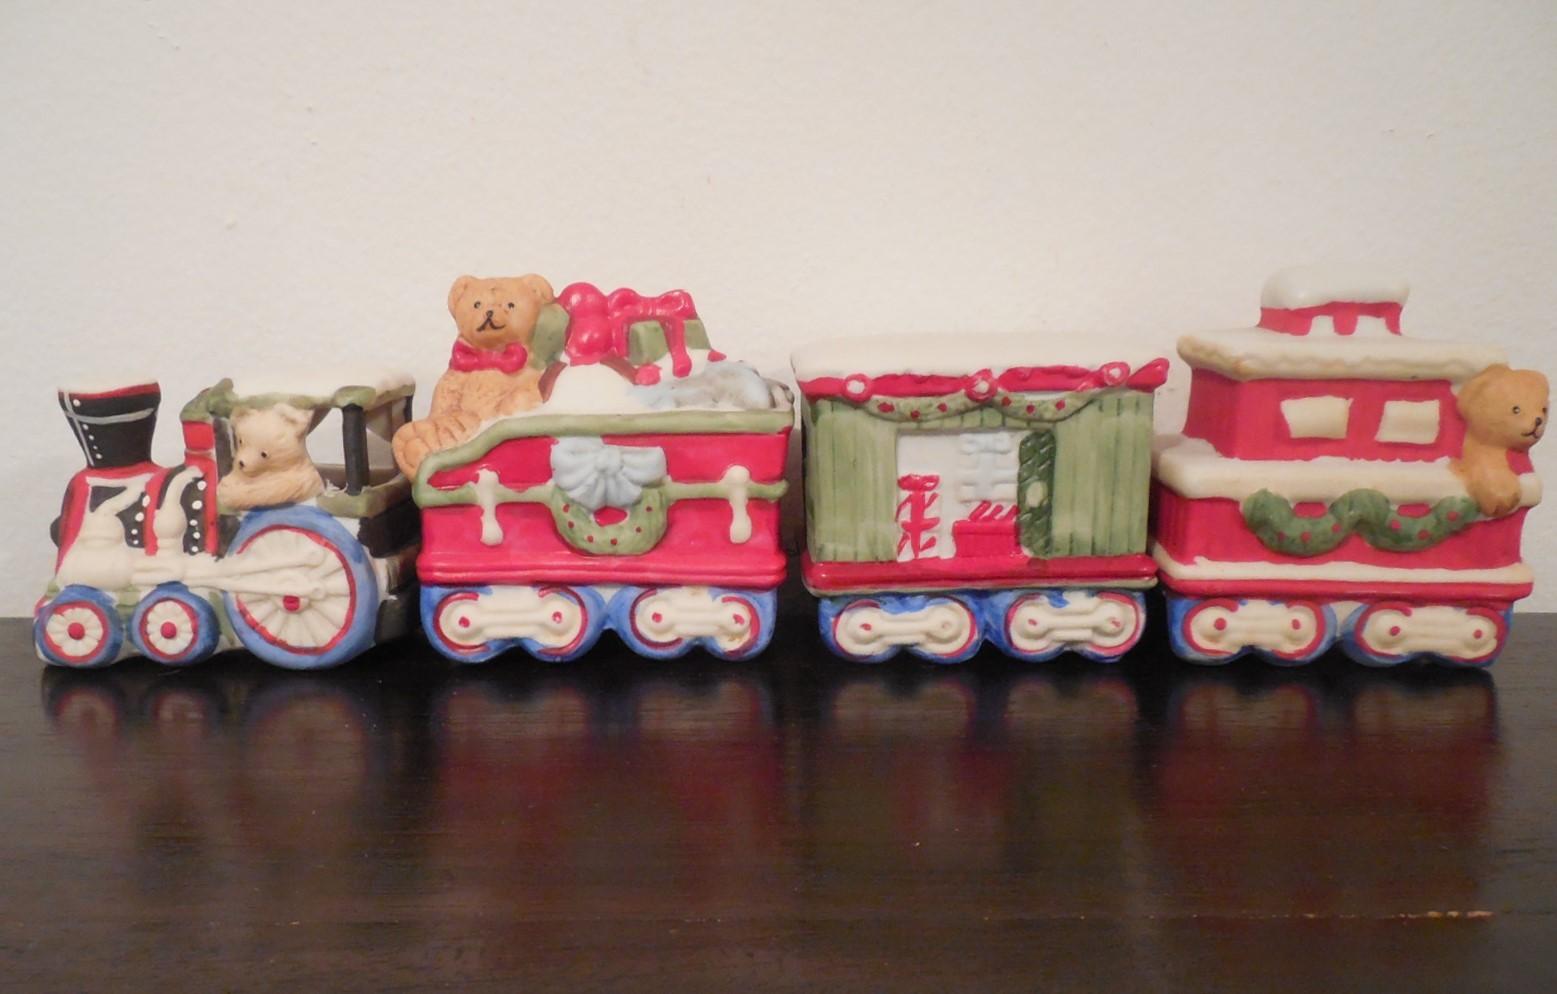 Christmas Train, Ceramic Train Figurine, and 50 similar items